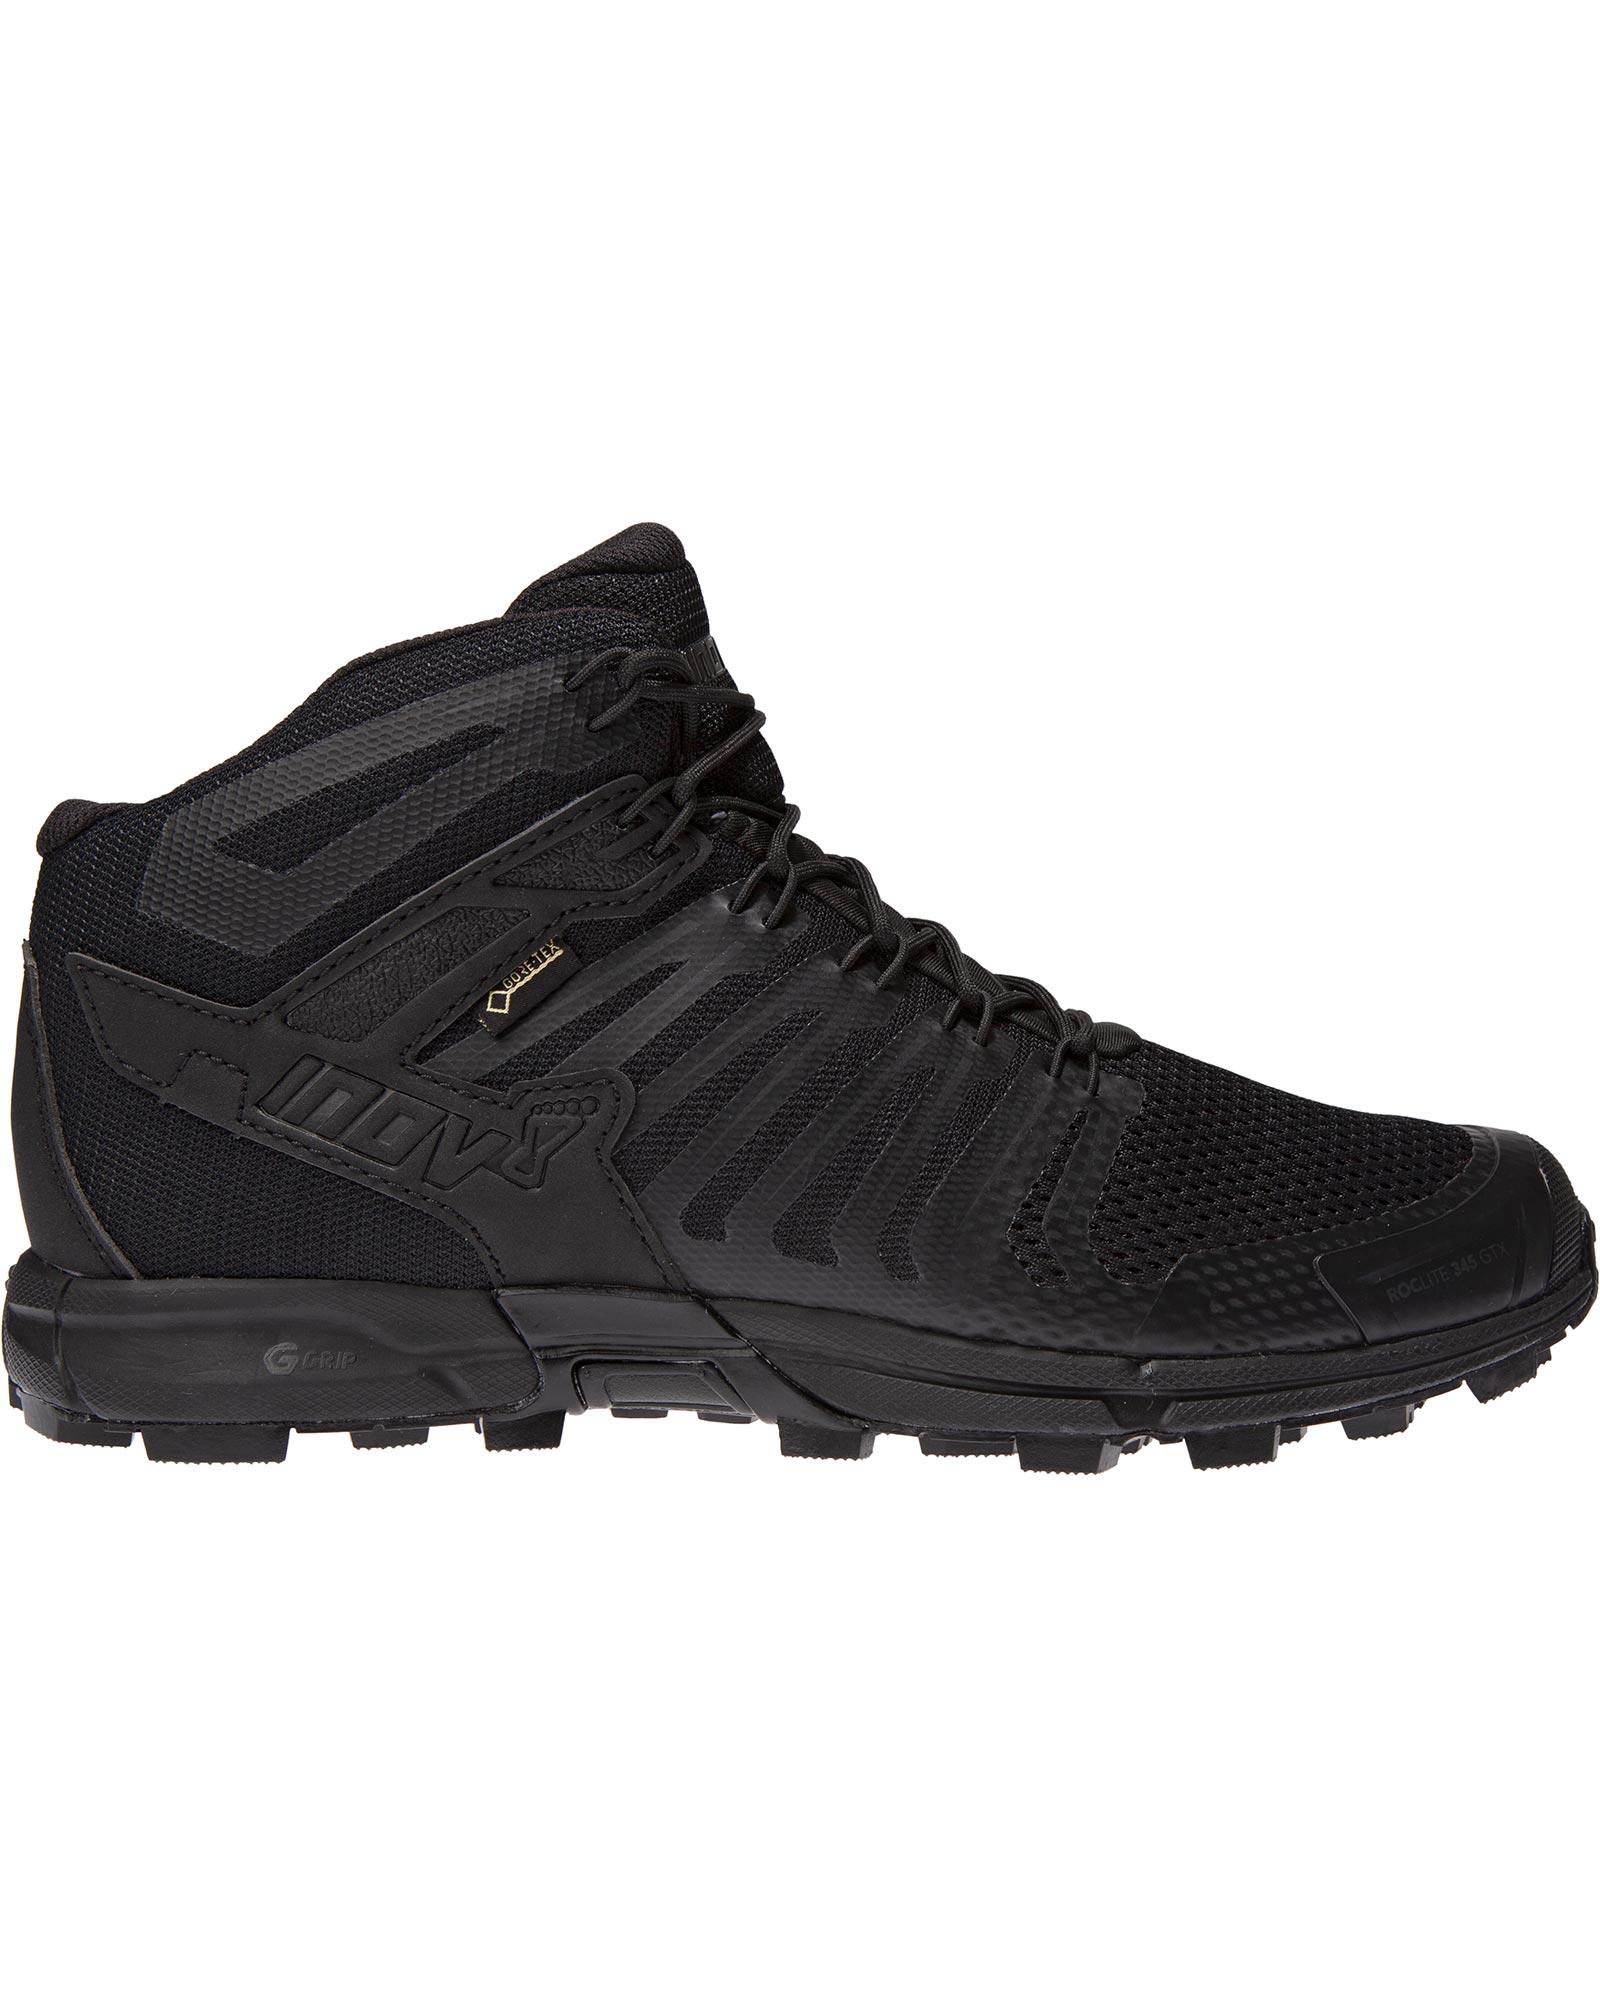 Inov-8 Roclite G 345 Mid GORE-TEX Men's Boots 0